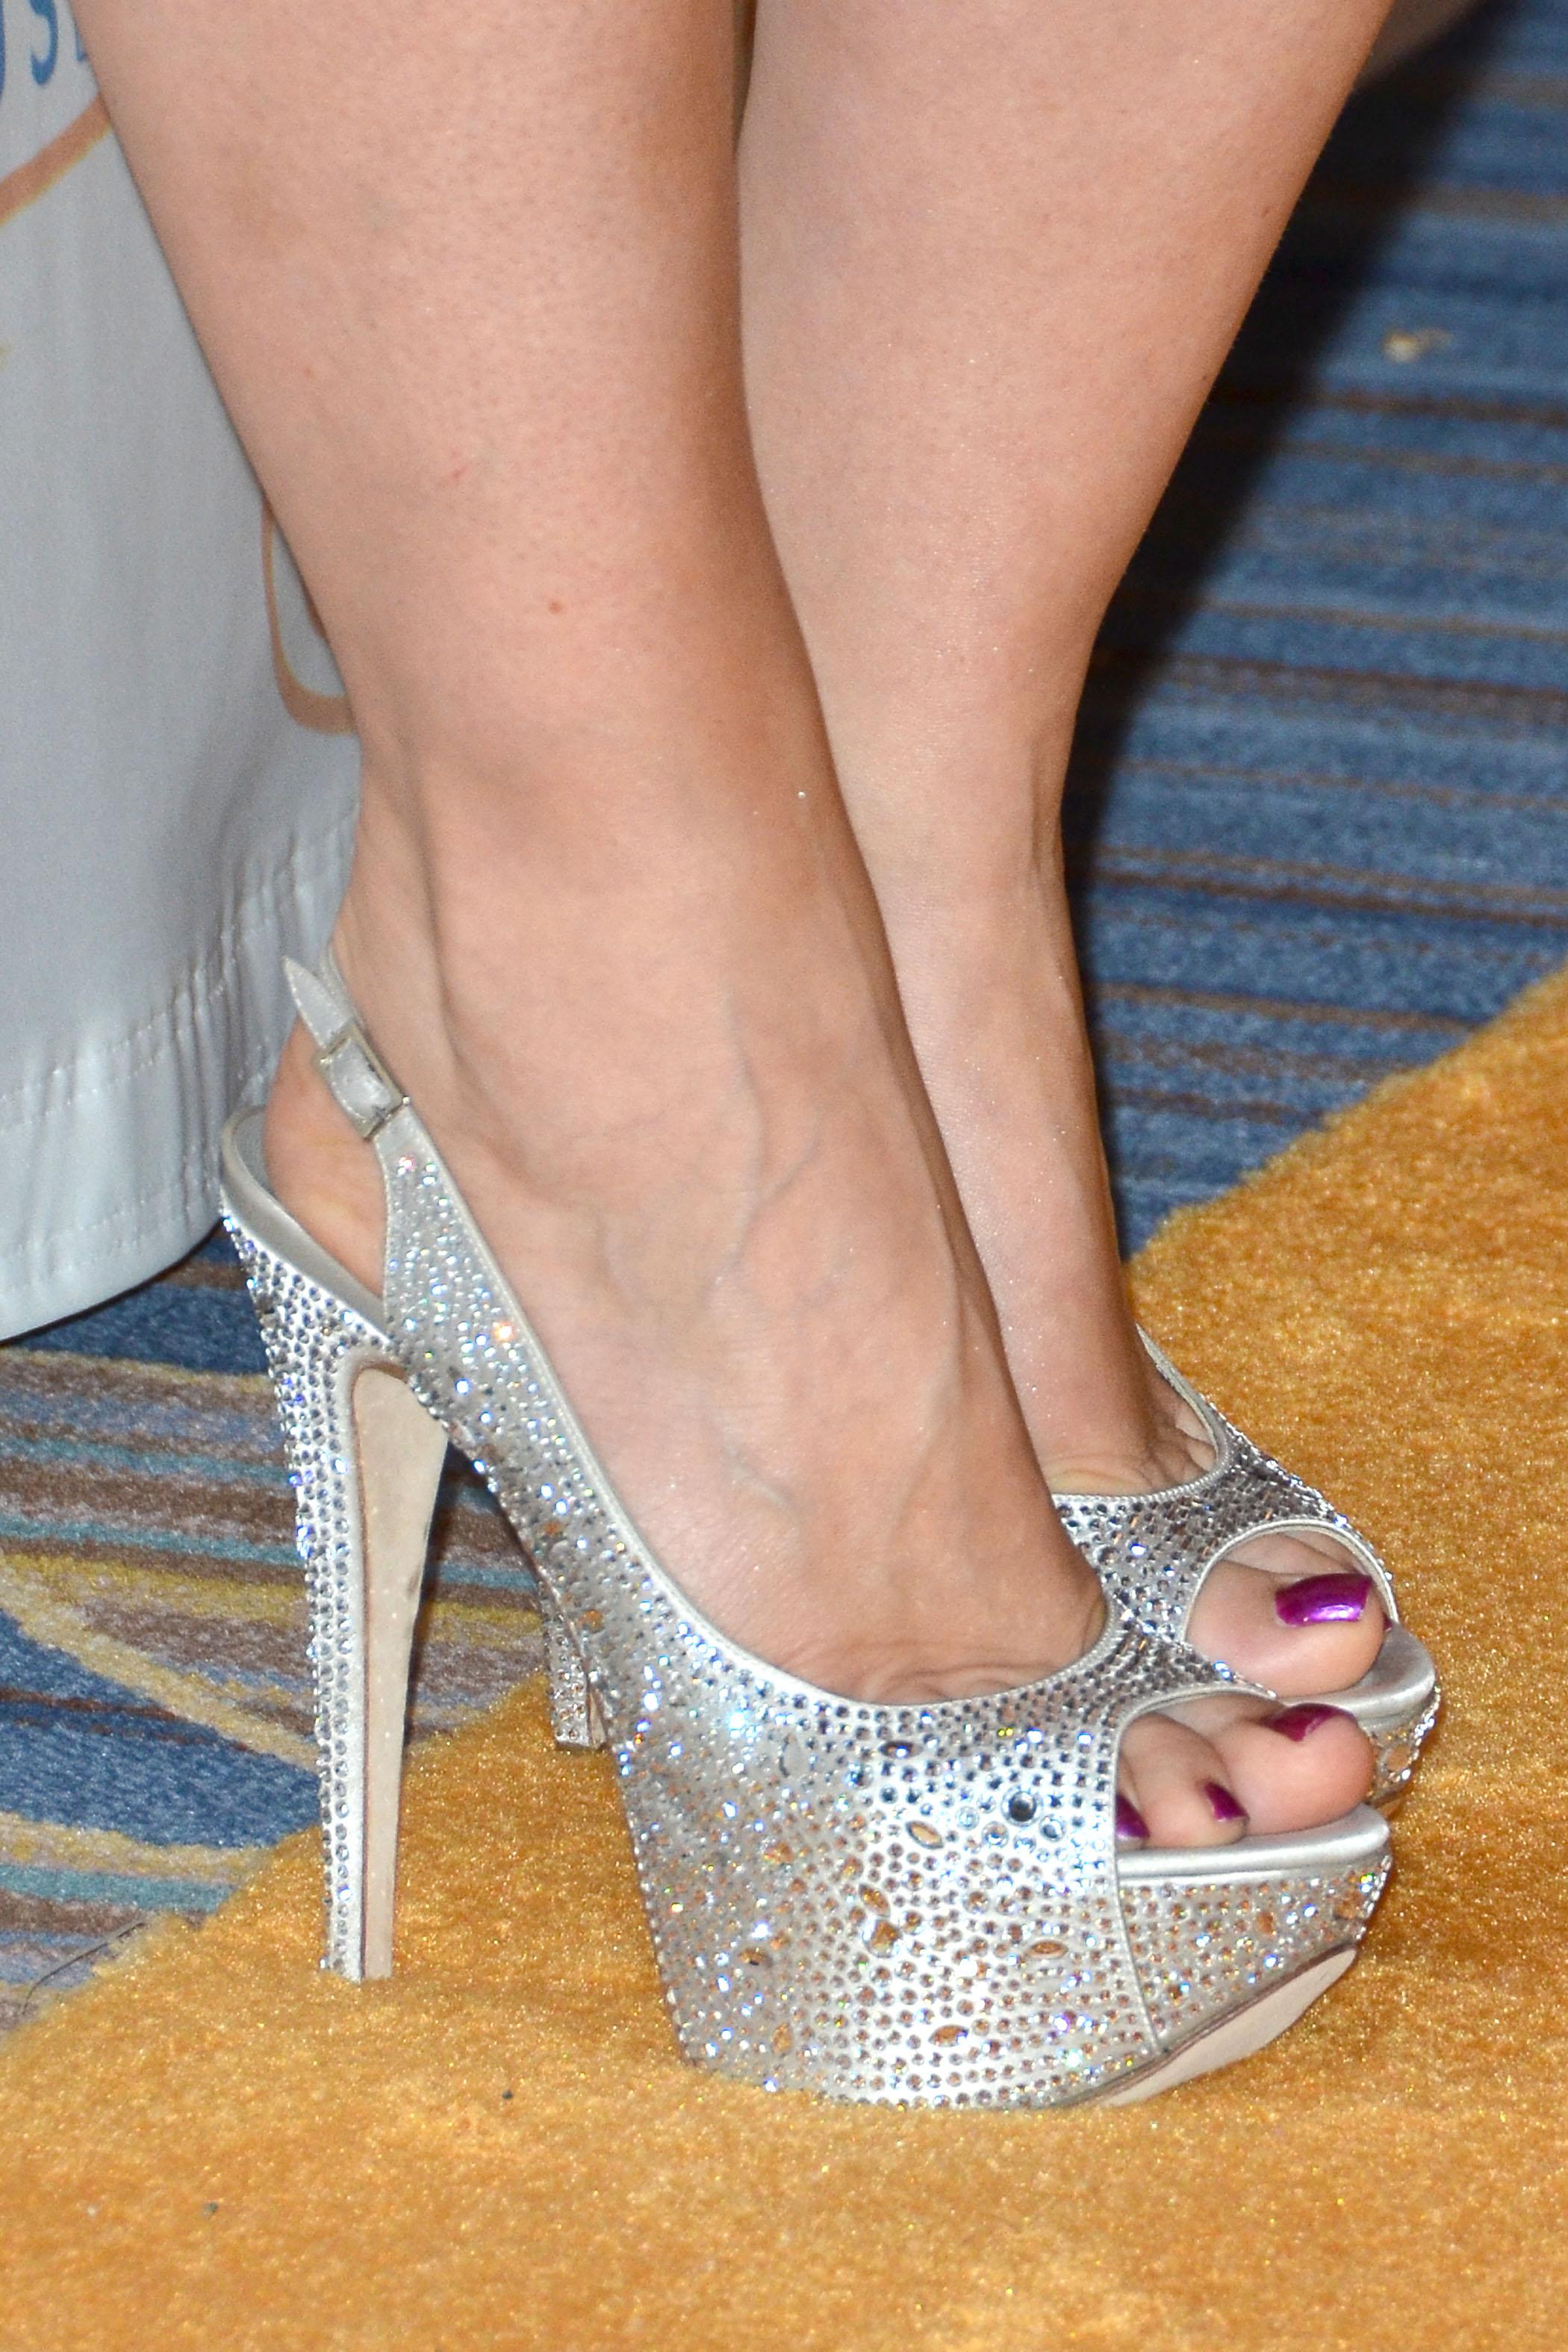 Natasha Bedingfields Feet